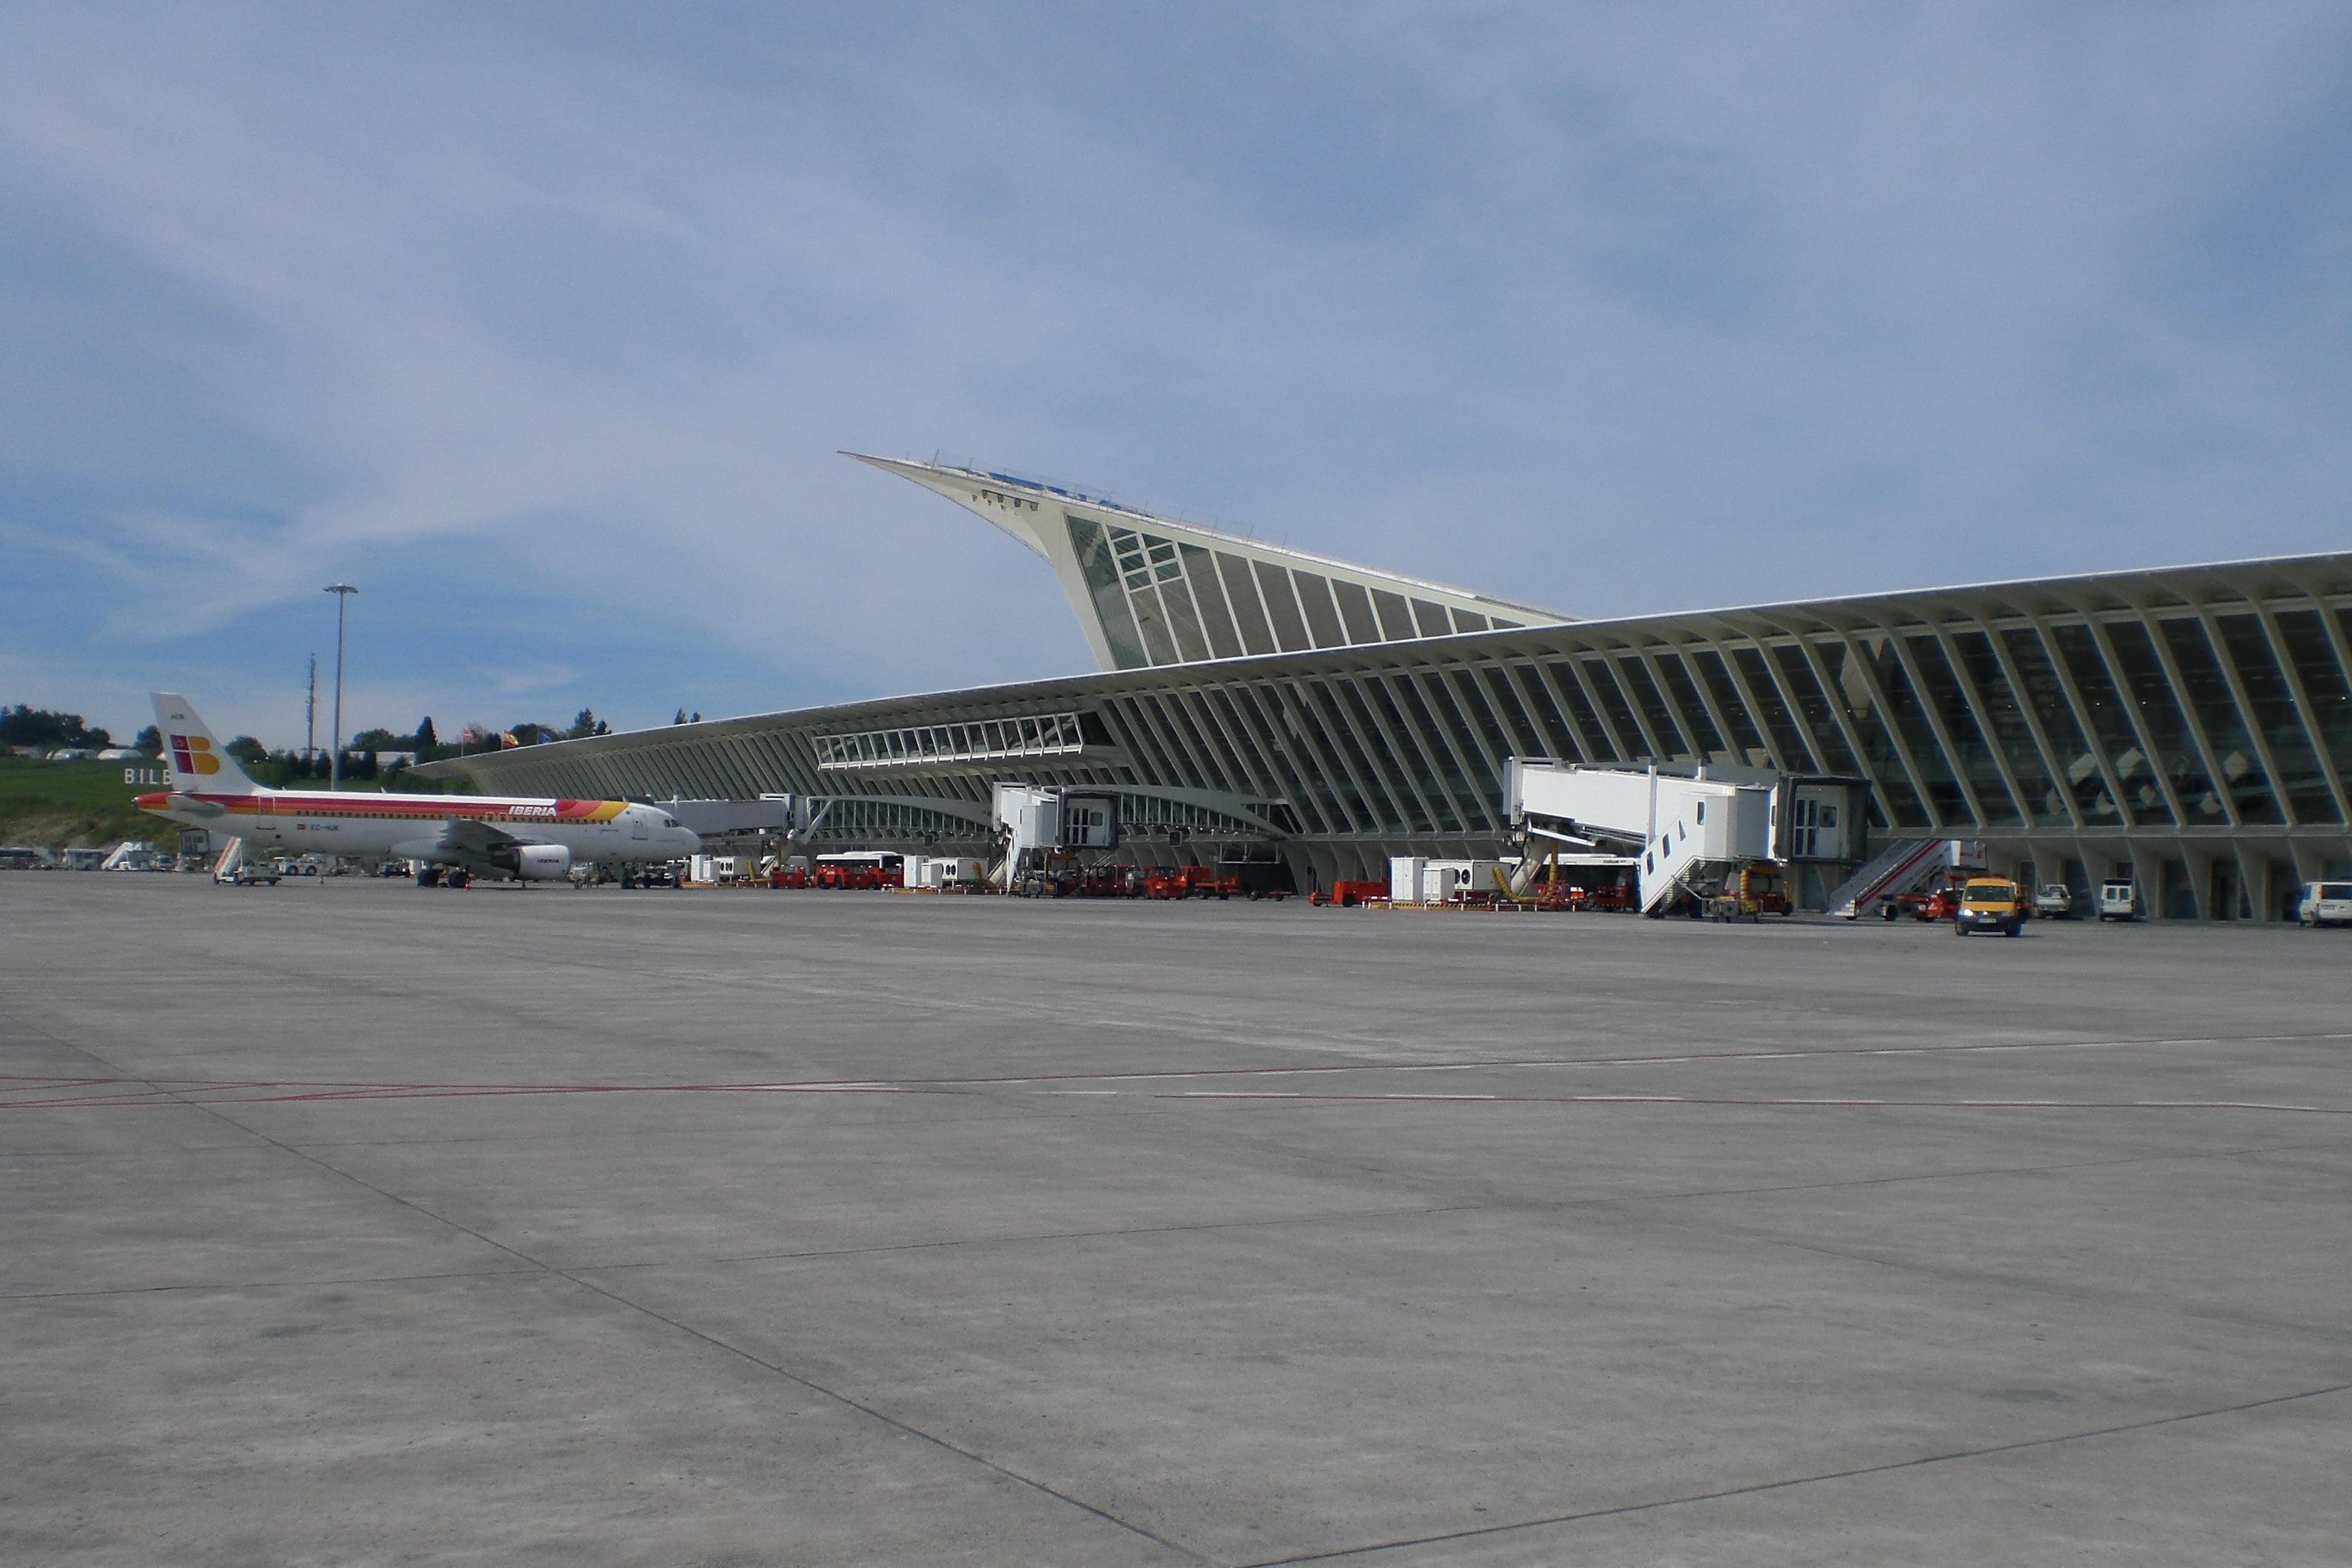 Aeroporto Bilbao : Aeropuerto de bilbao en el país vasco